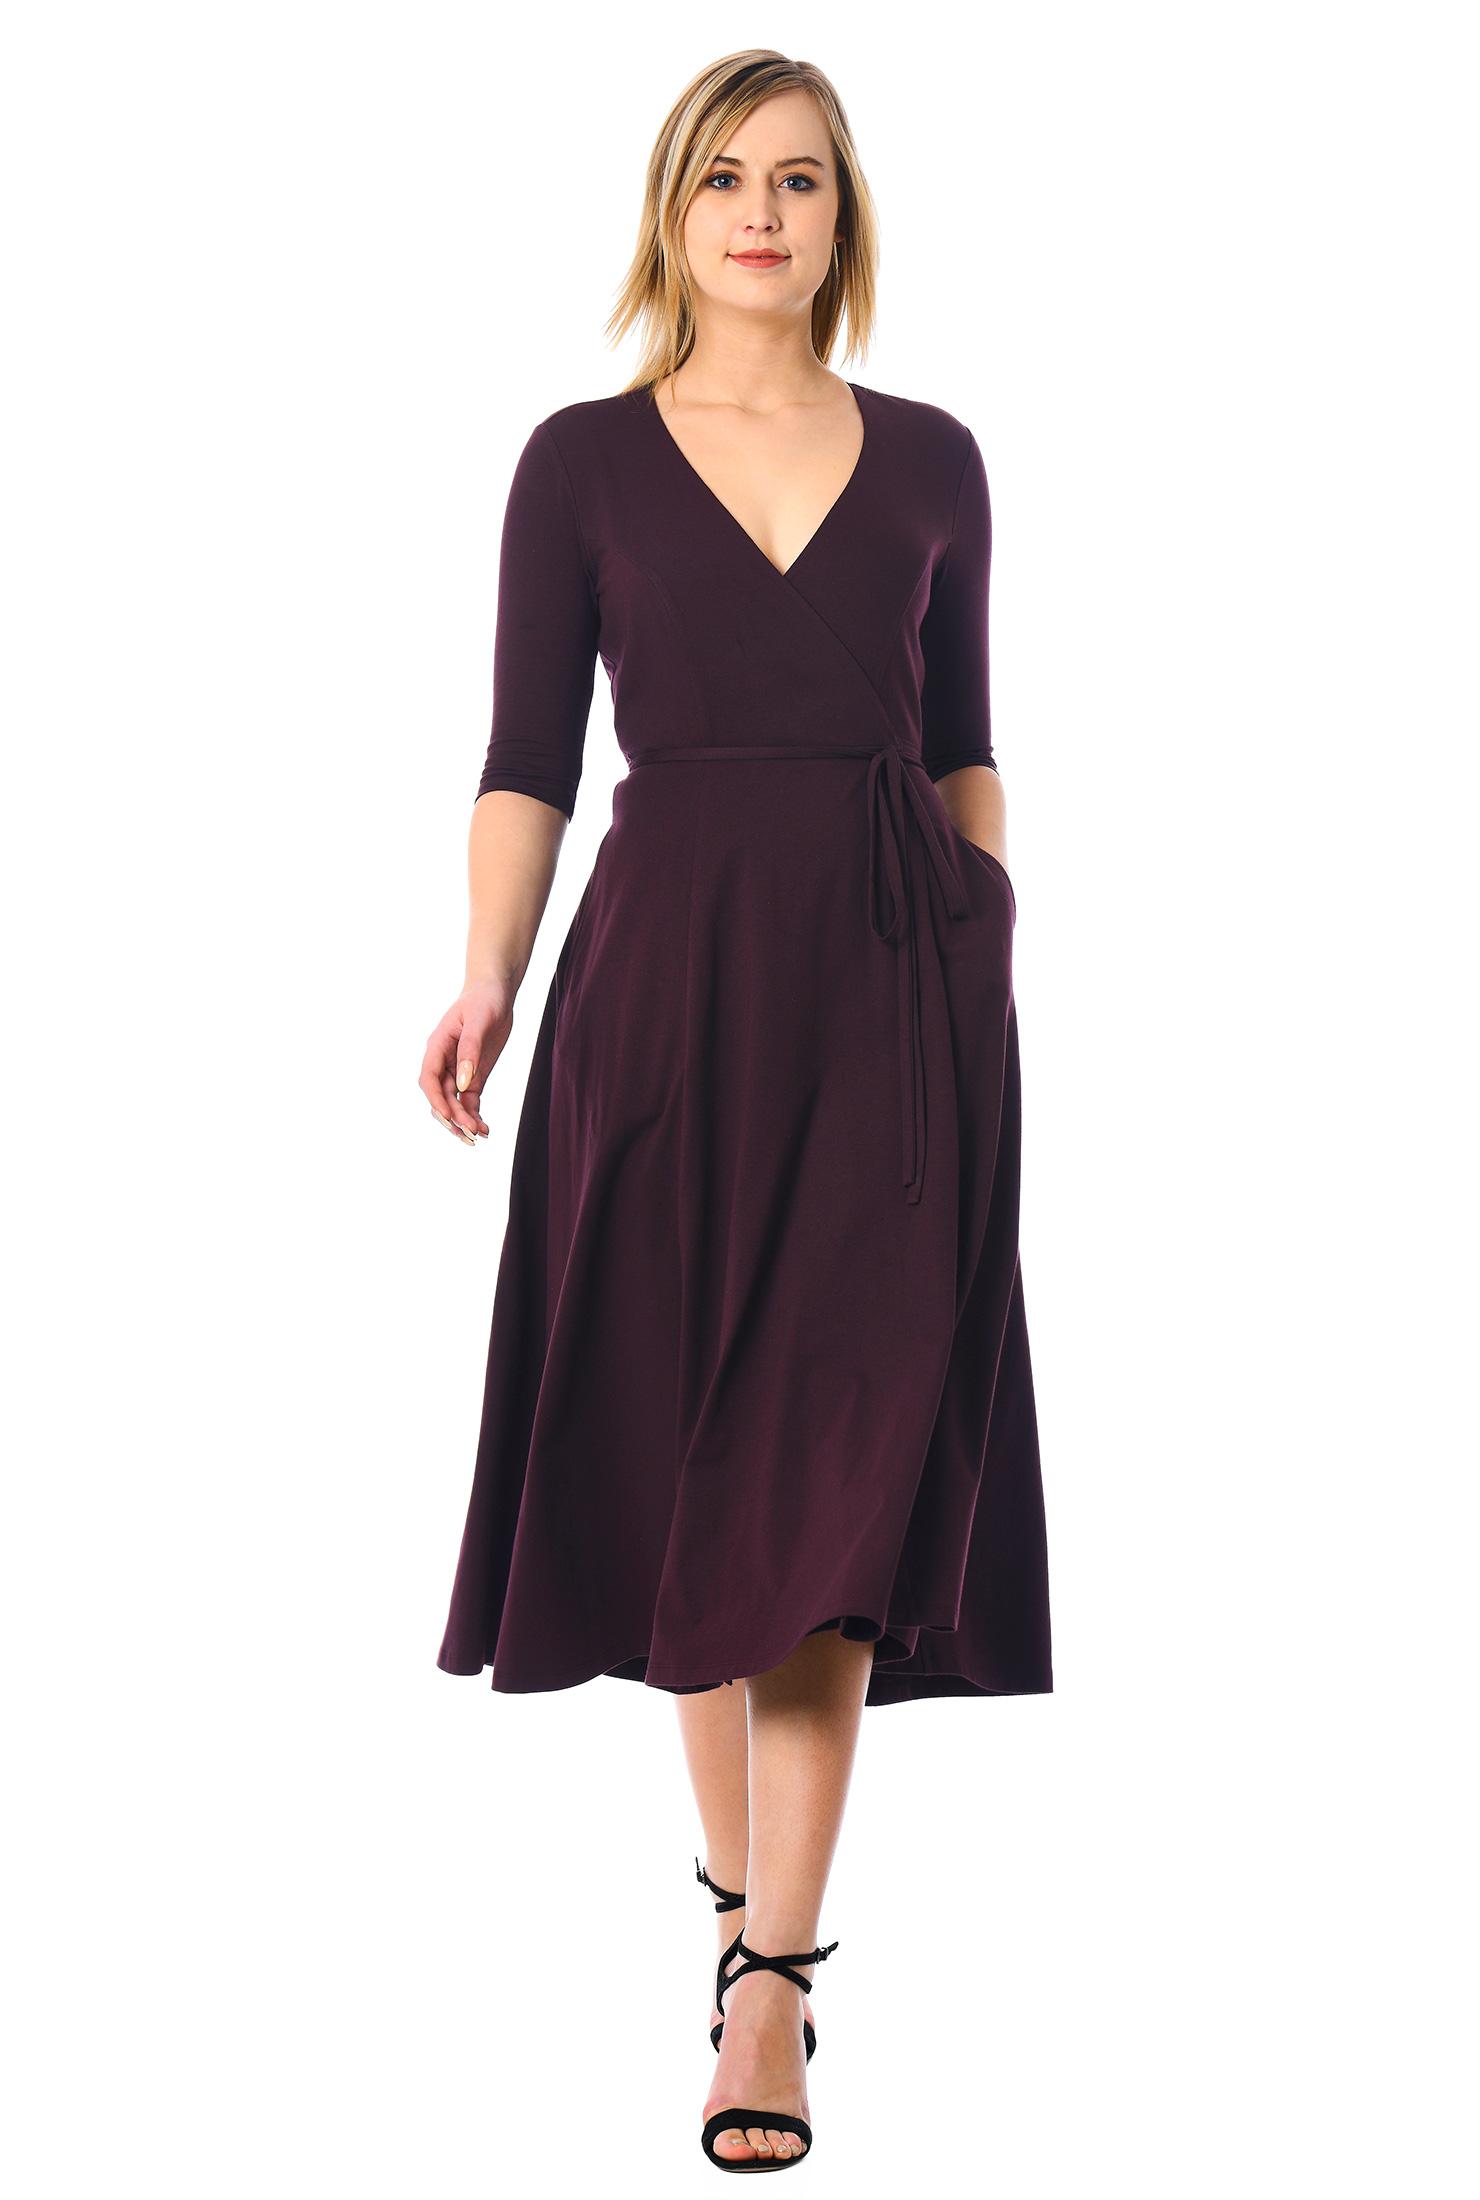 dab799ca42 Women s Fashion Clothing 0-36W and Custom